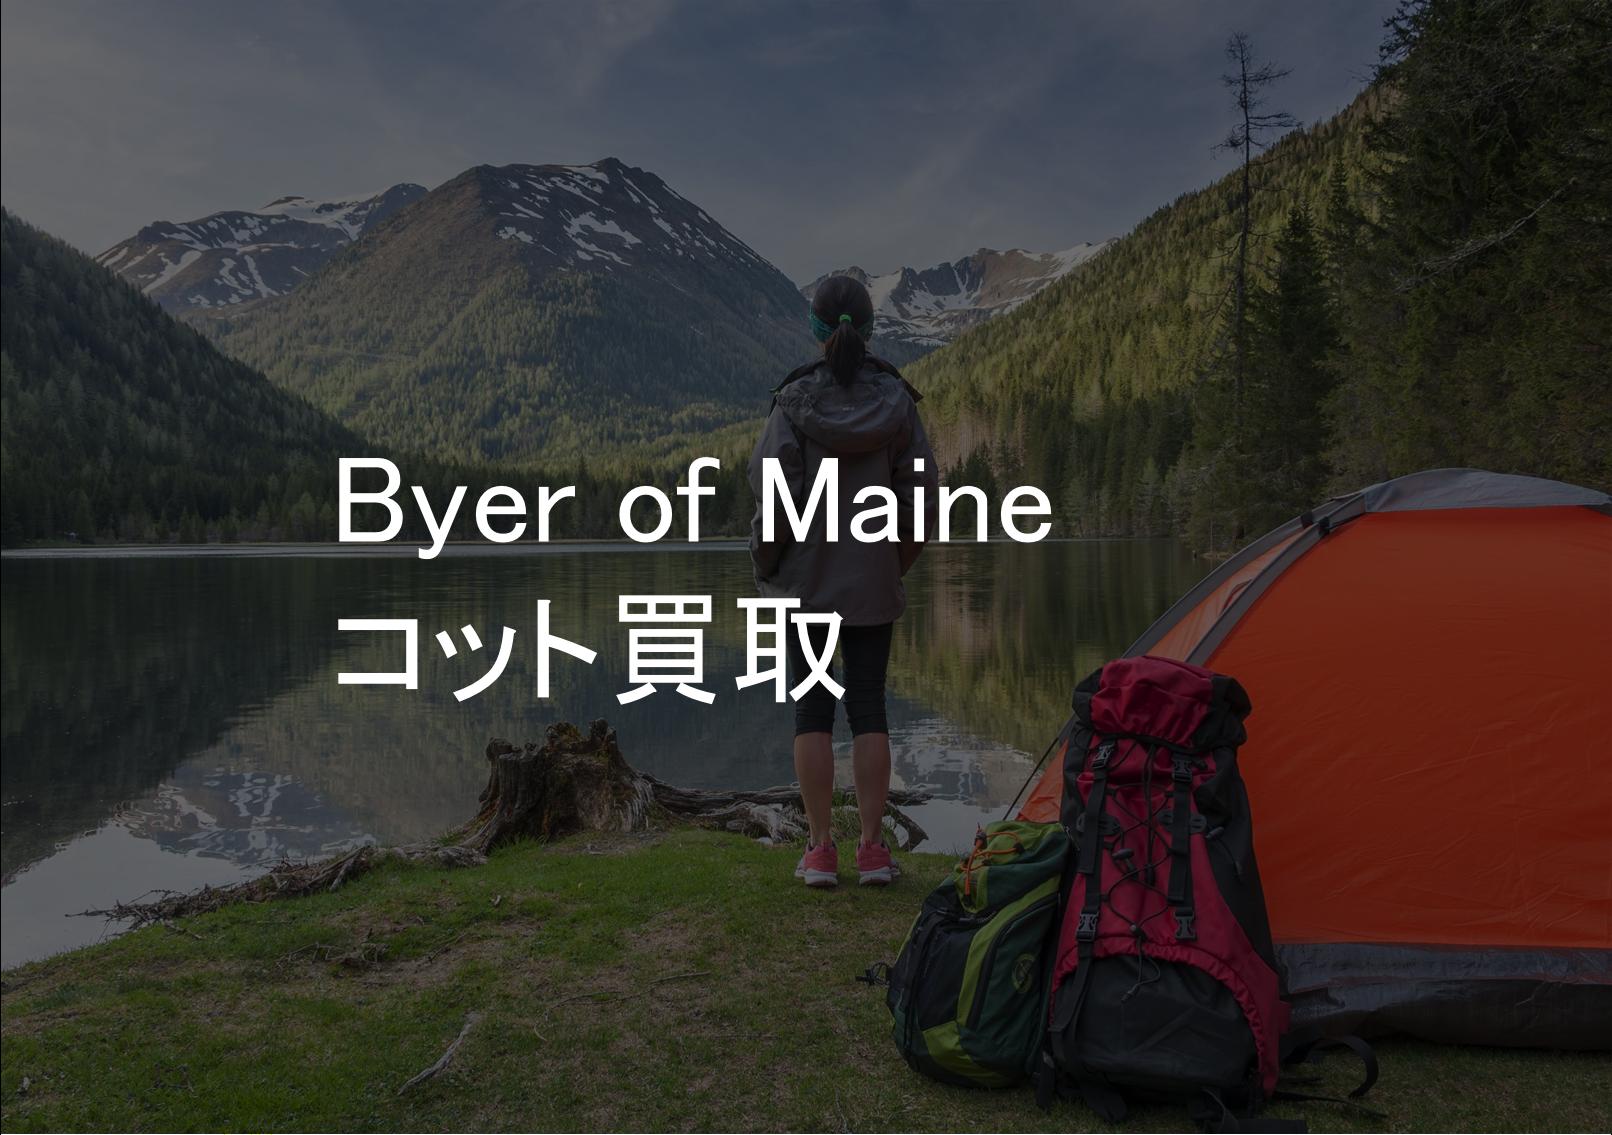 Byer of Maine(バイヤーオブメイン)コット買取なら!